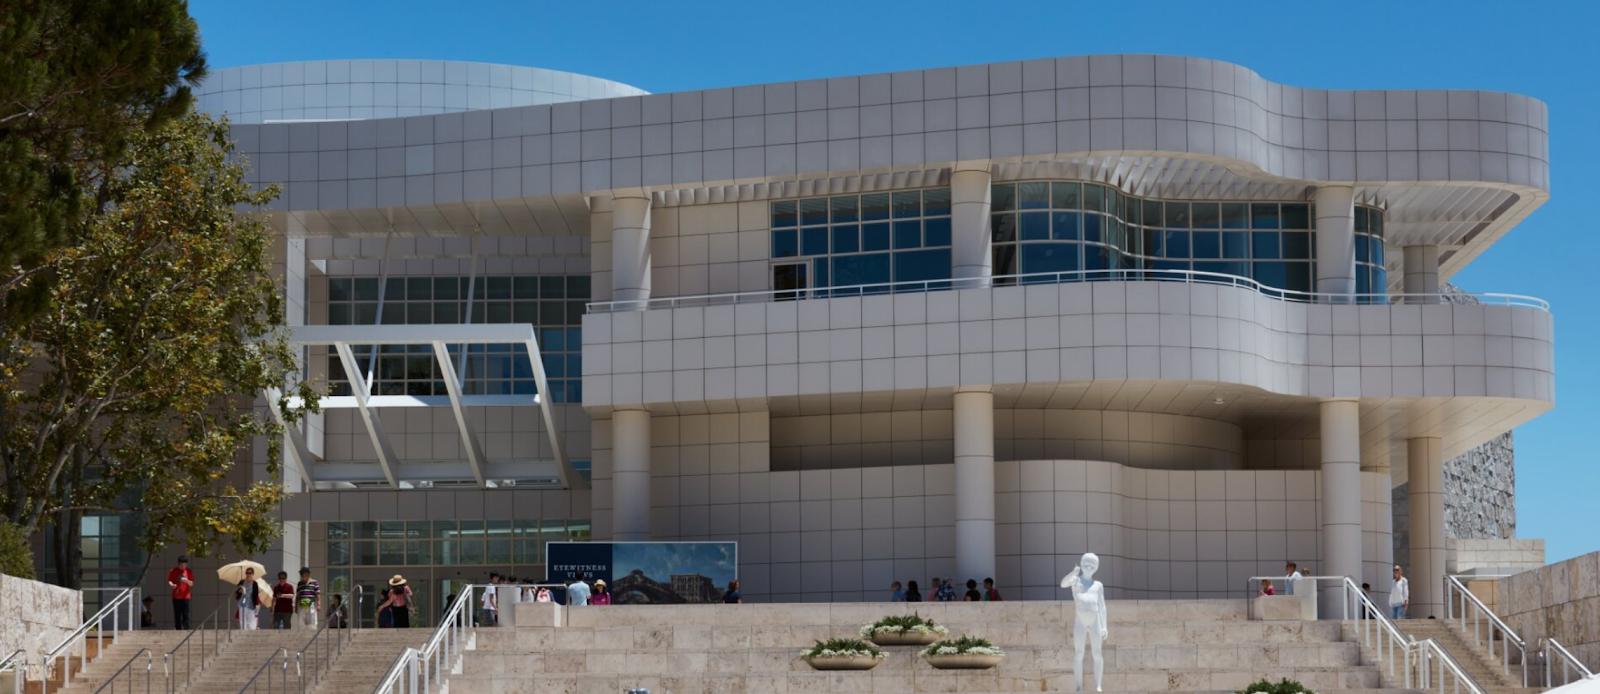 The J. Paul Getty Museum 洛杉矶盖蒂博物馆